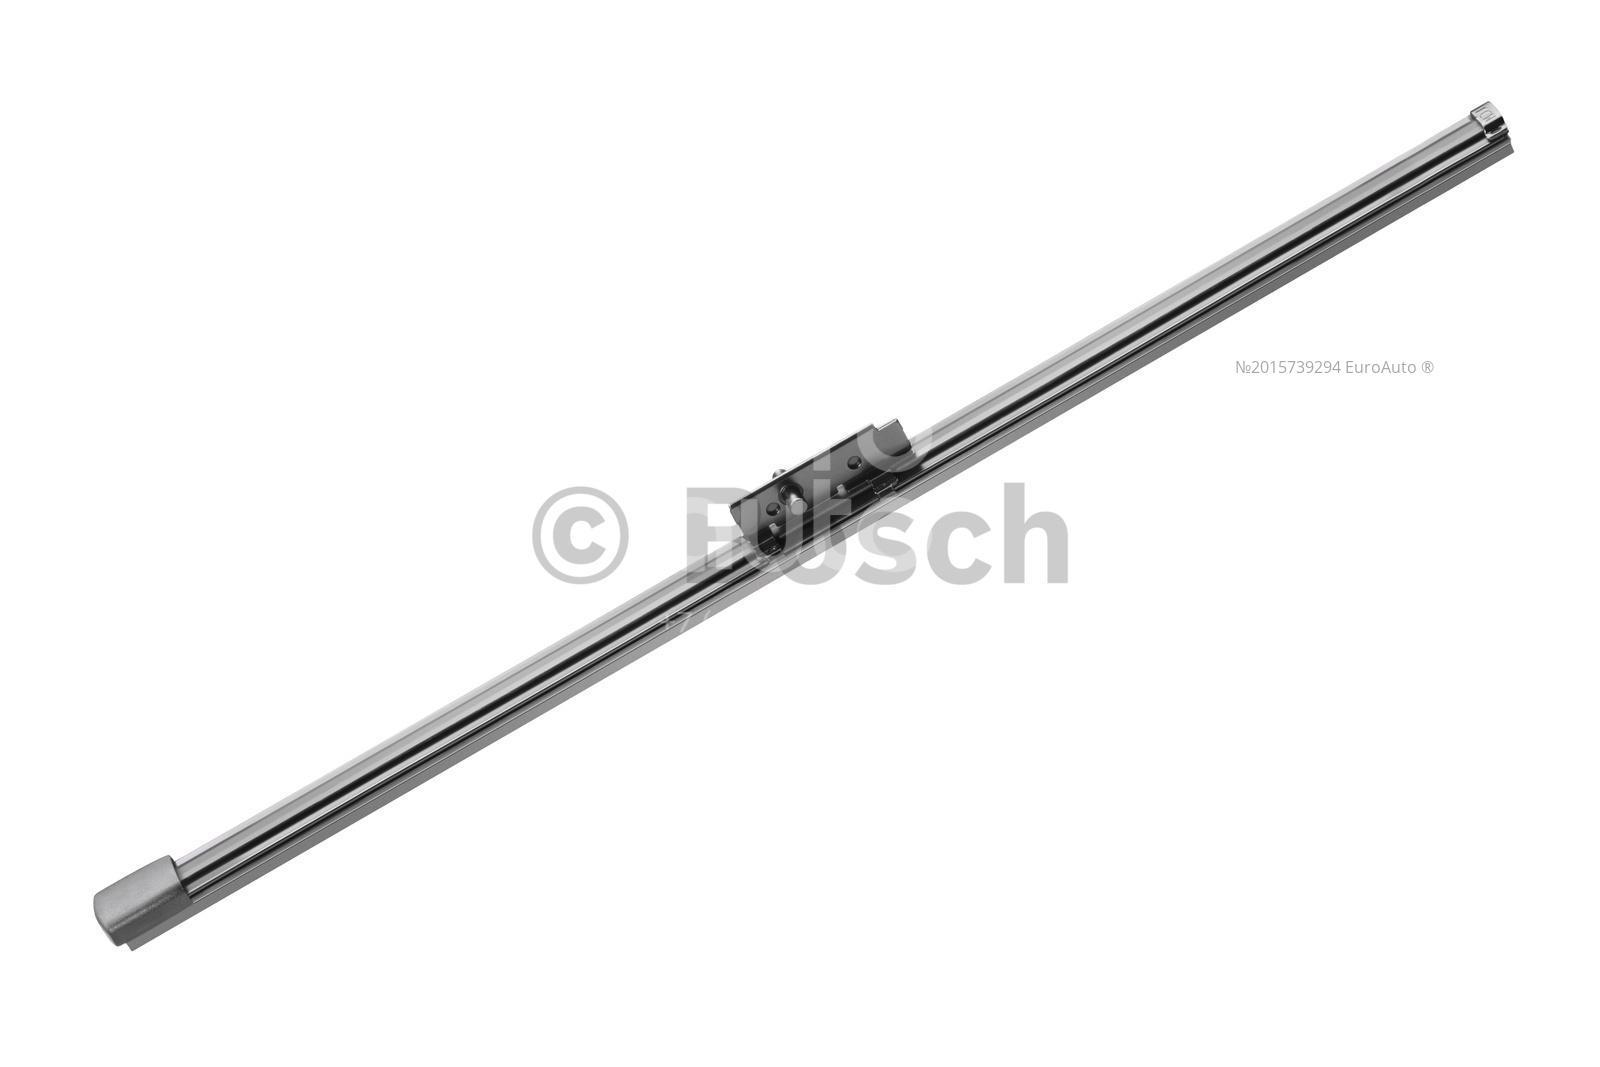 Щетка стеклоочистителя для BMW 3-серия E90/E91 2005-2012 - Фото №1